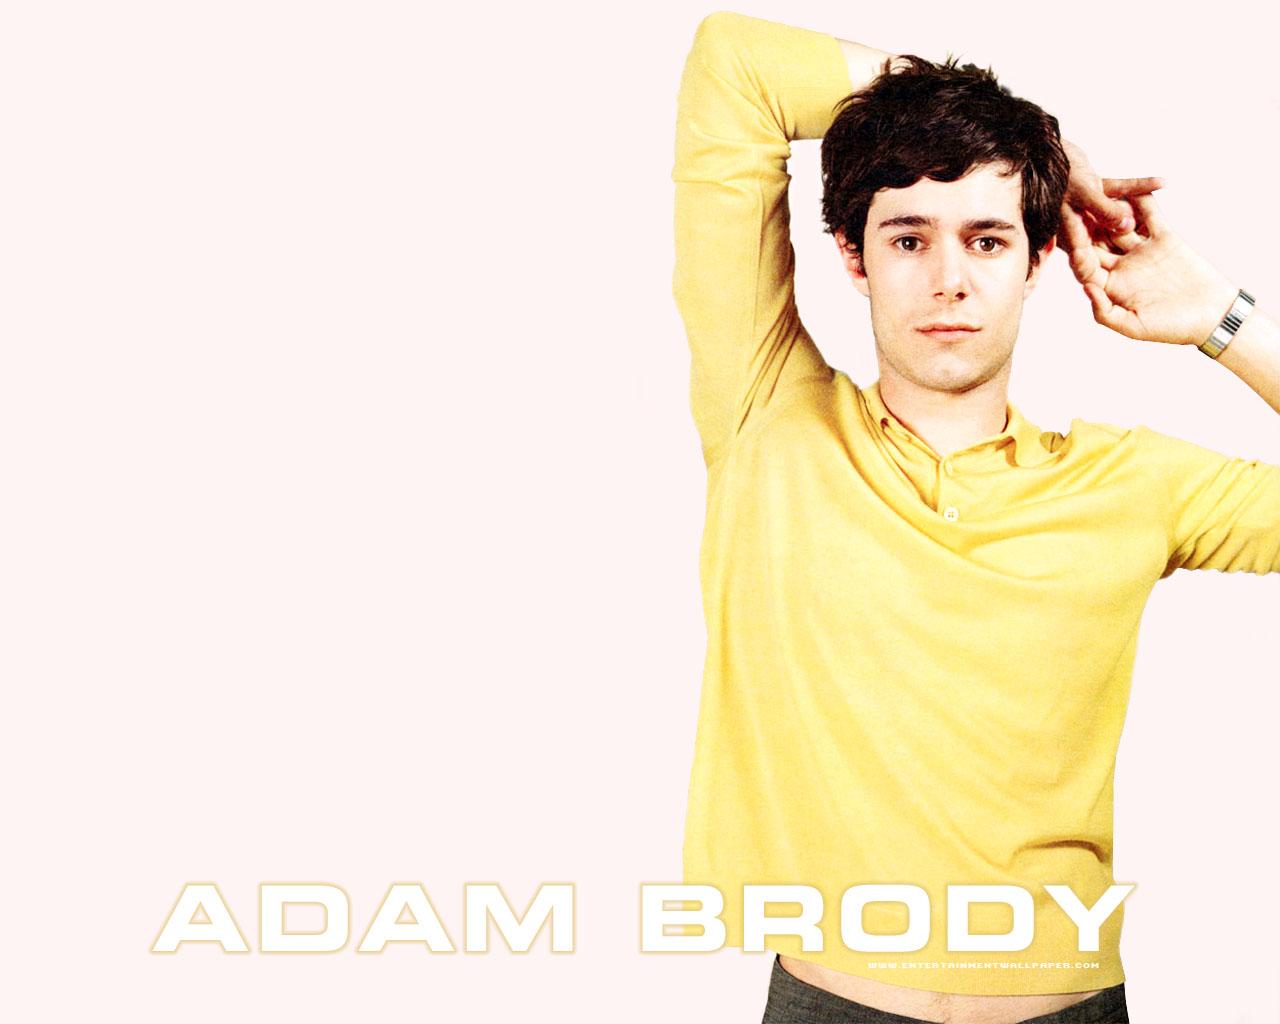 http://2.bp.blogspot.com/-JBgrW_csFaI/TzvDUnh2YOI/AAAAAAAAKz4/2AbBmwuTlrs/s1600/adam_brody3.jpg